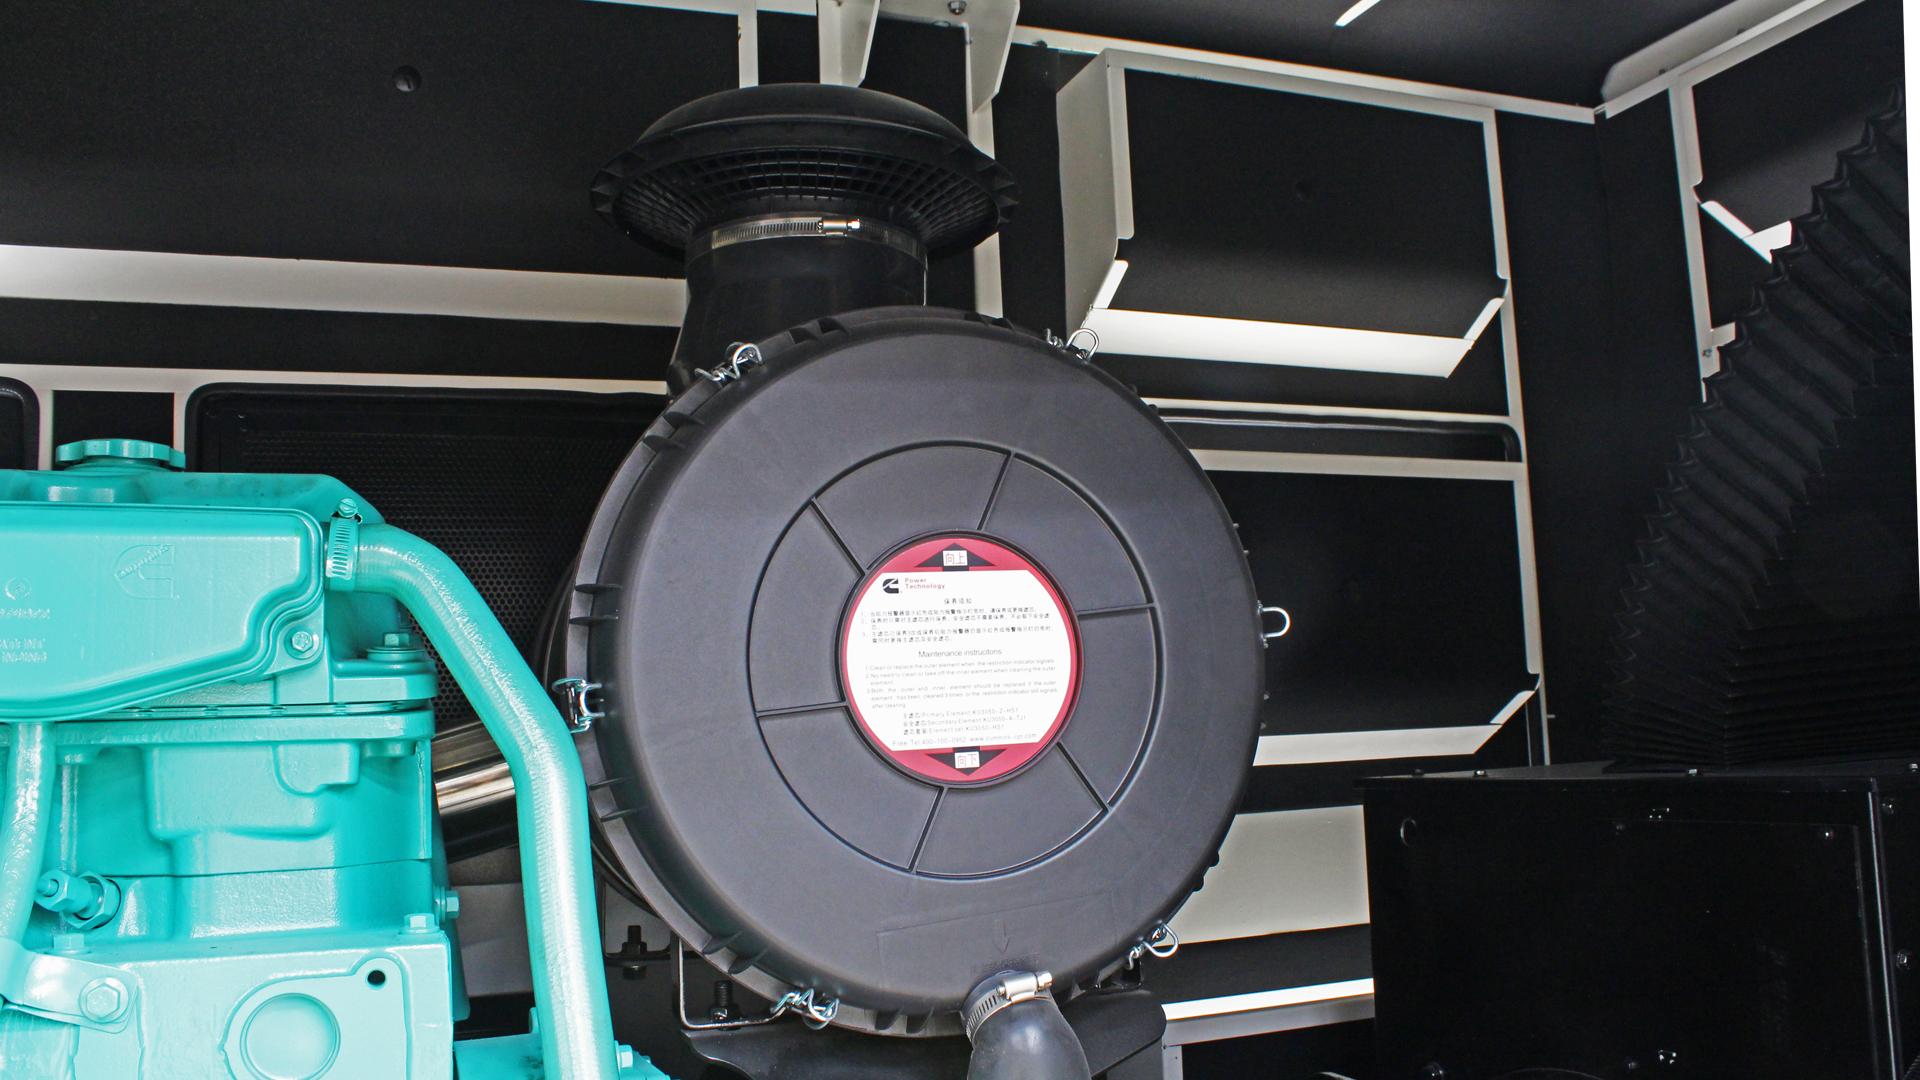 Turbocharger on UKC440ECO and 480kVA and 500kVA gensets in Evopower ECO range